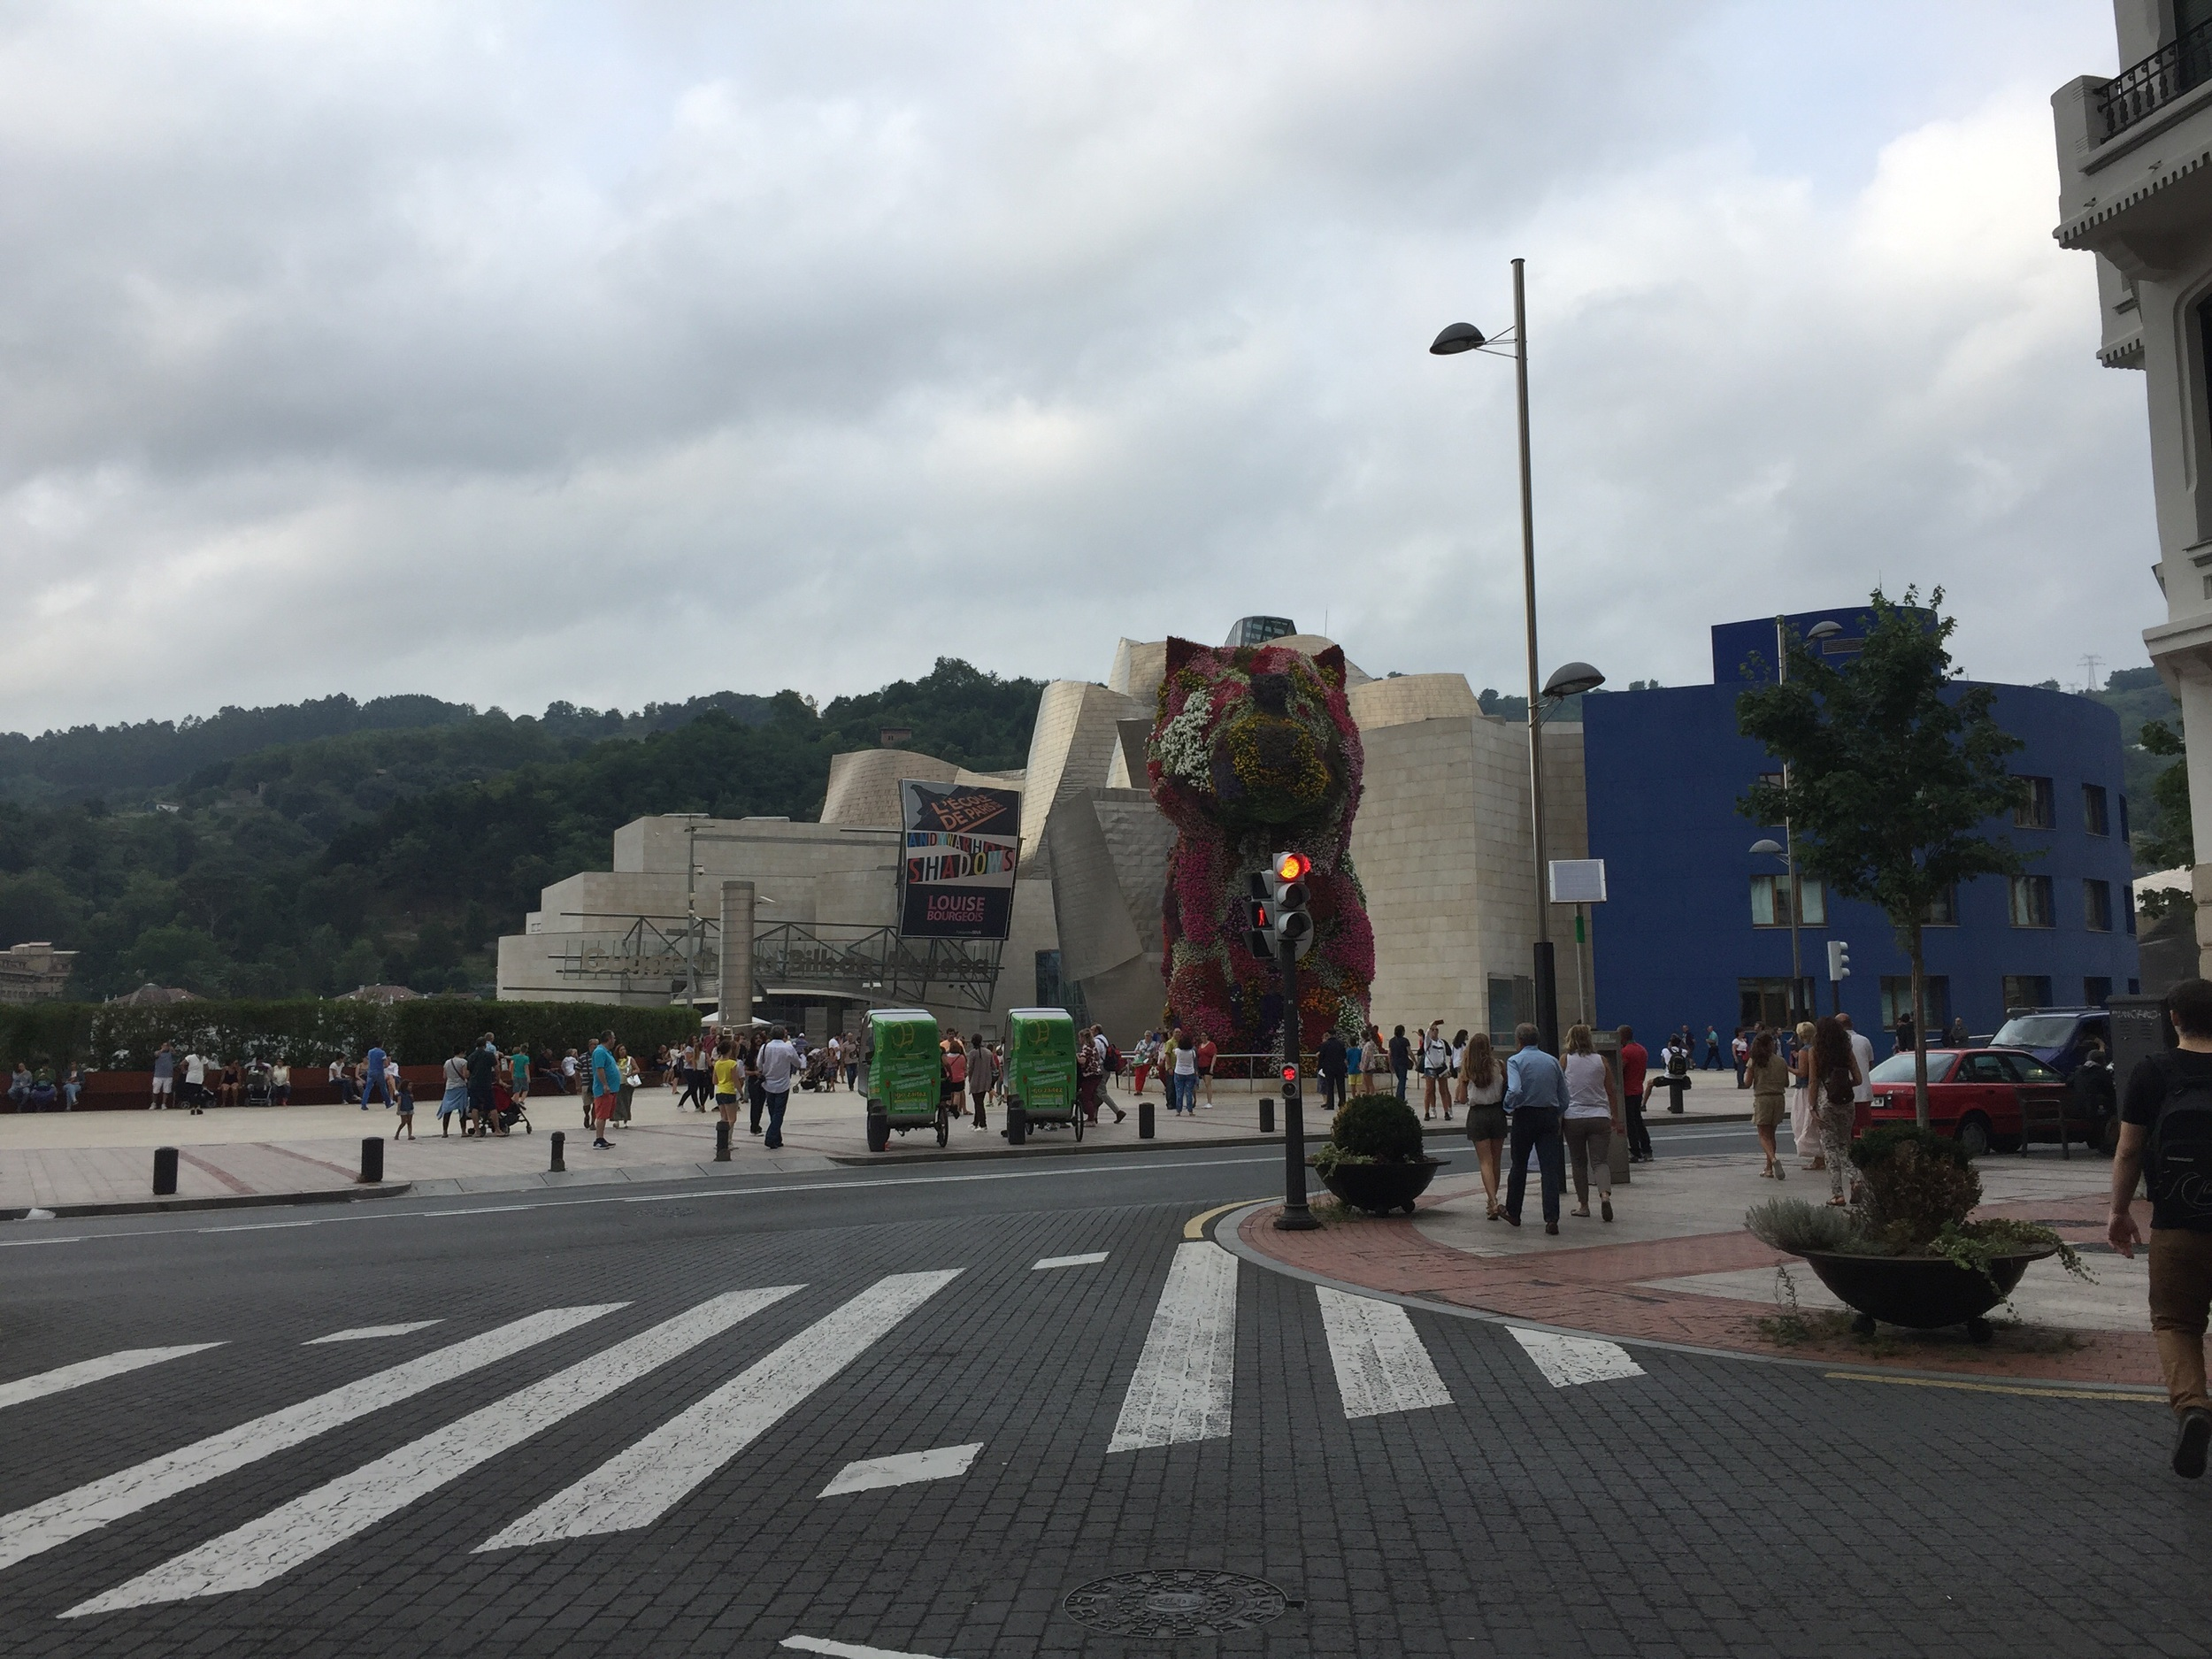 Guggenheim Bilbao with Jeff Koons'  Puppy